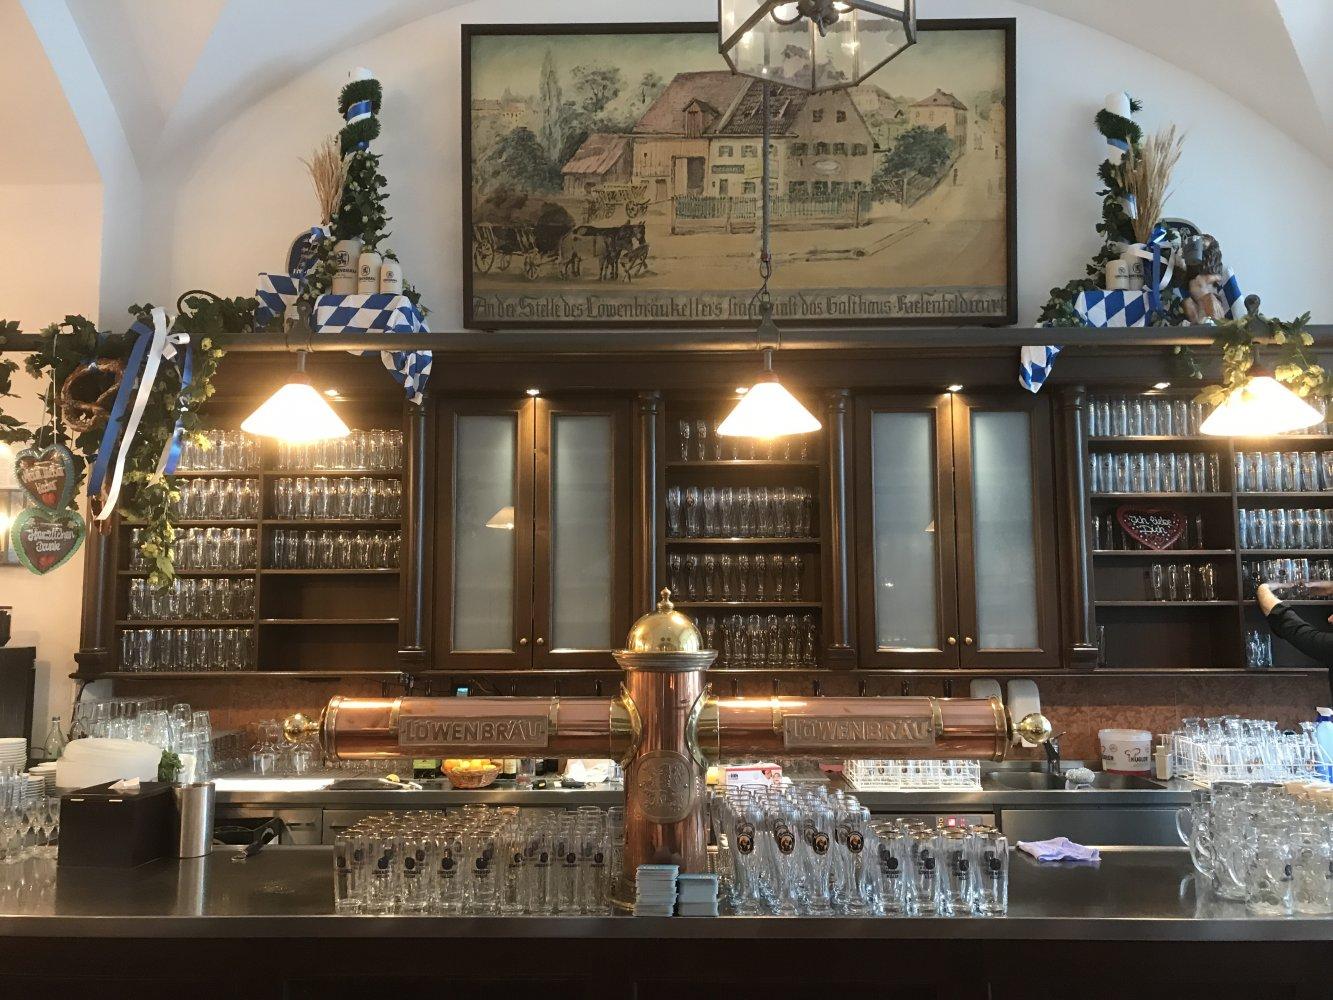 Bar Archive – Dirmeier Schanksysteme GmbH & Co KG